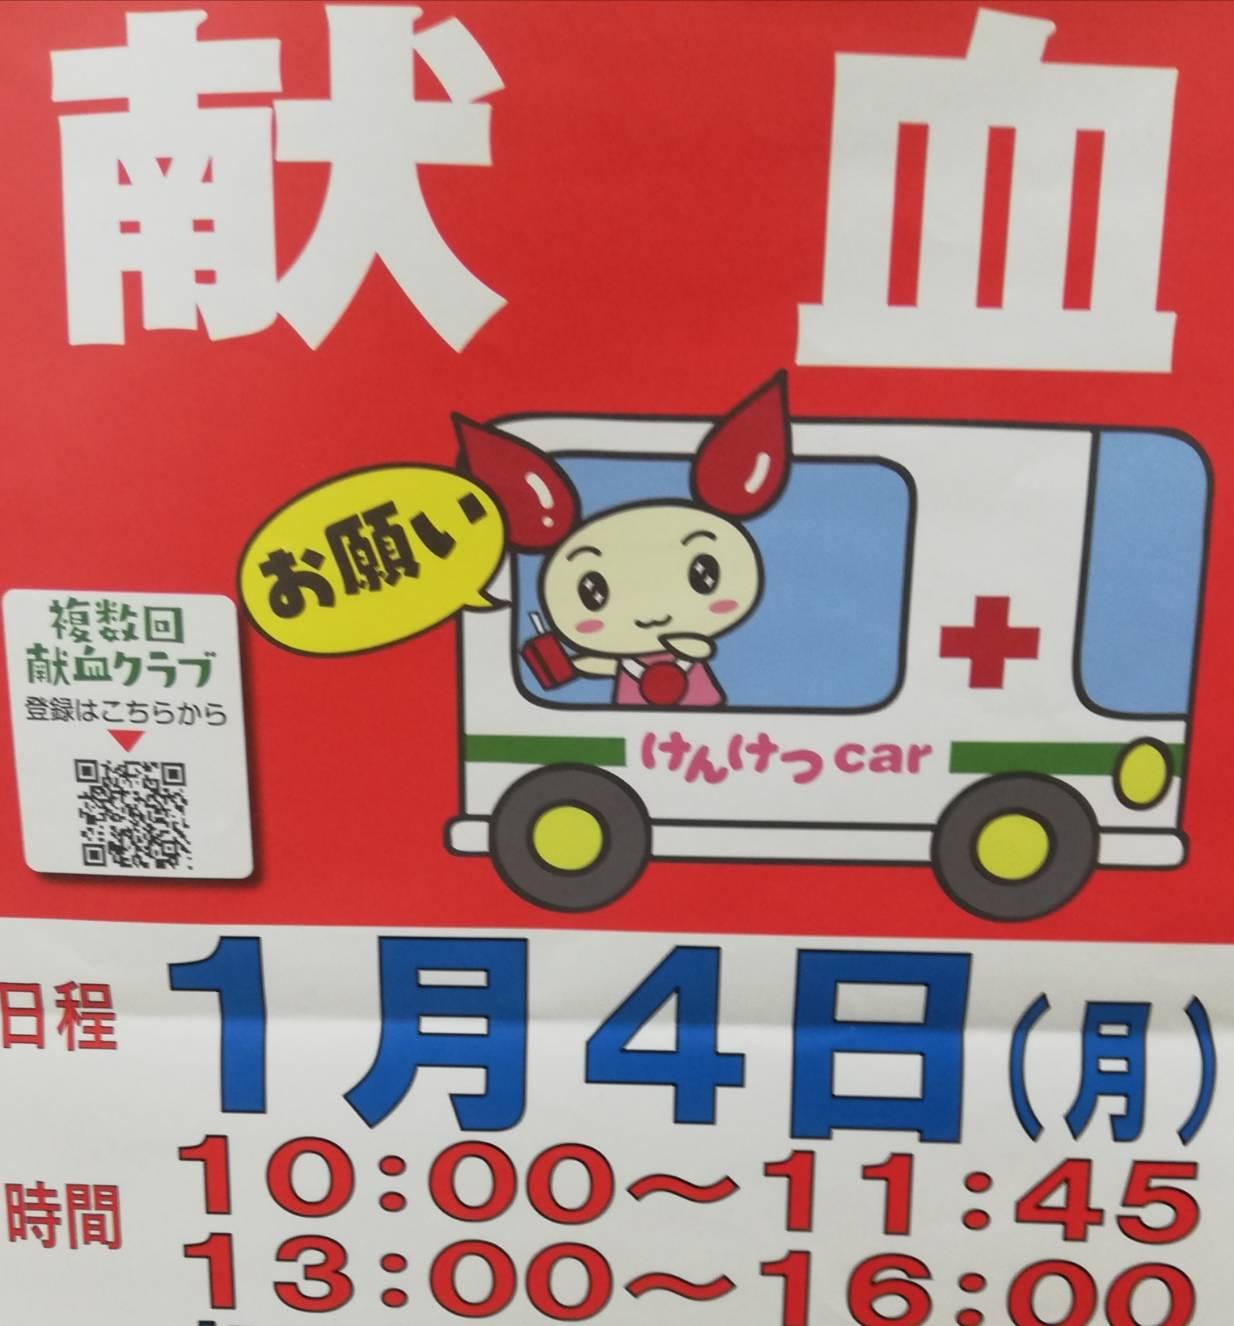 松戸市役所献血バス2021年